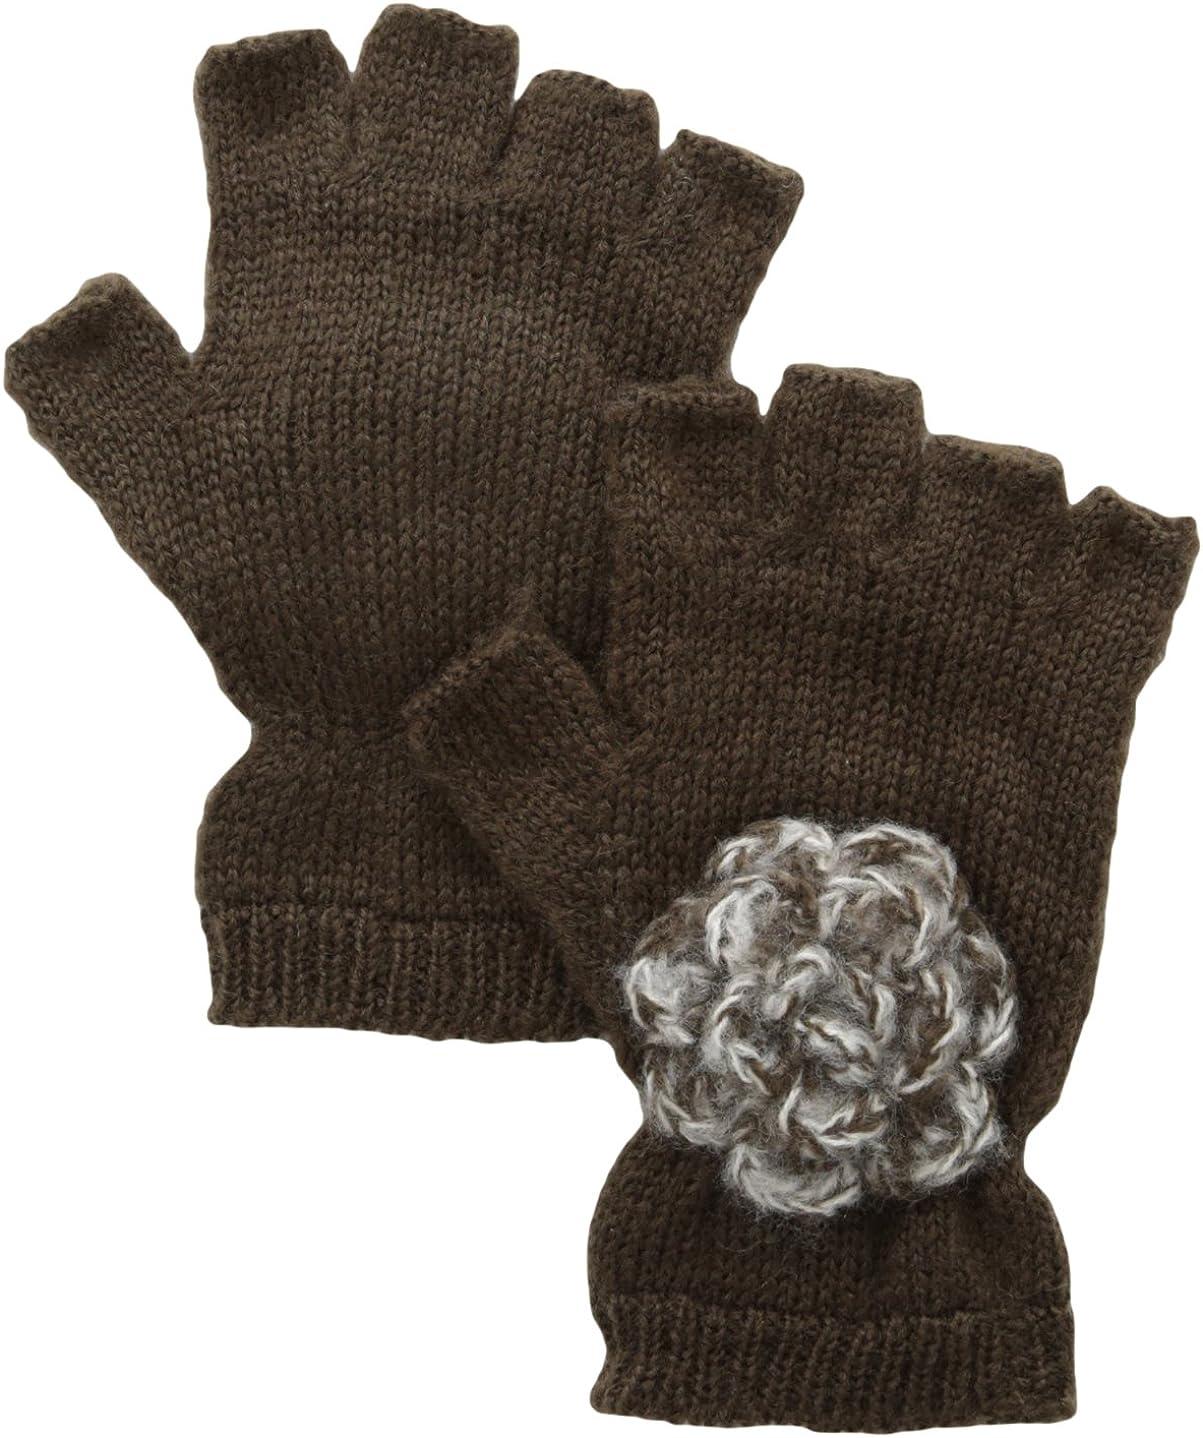 San Diego Hat Company Women's Knit Fingerless Glove with Crochet Flower